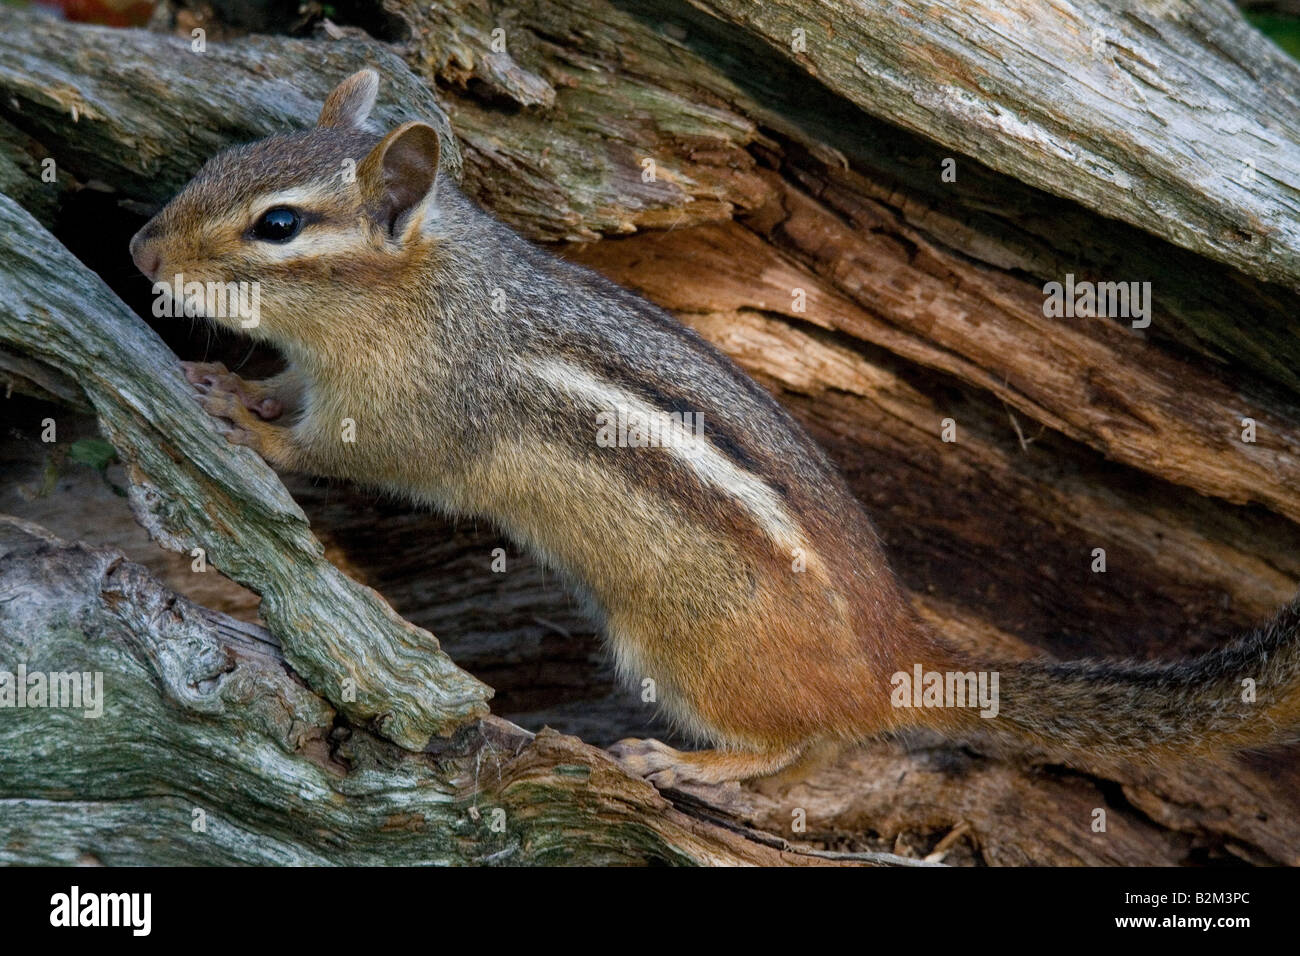 Eastern chipmunk - Stock Image